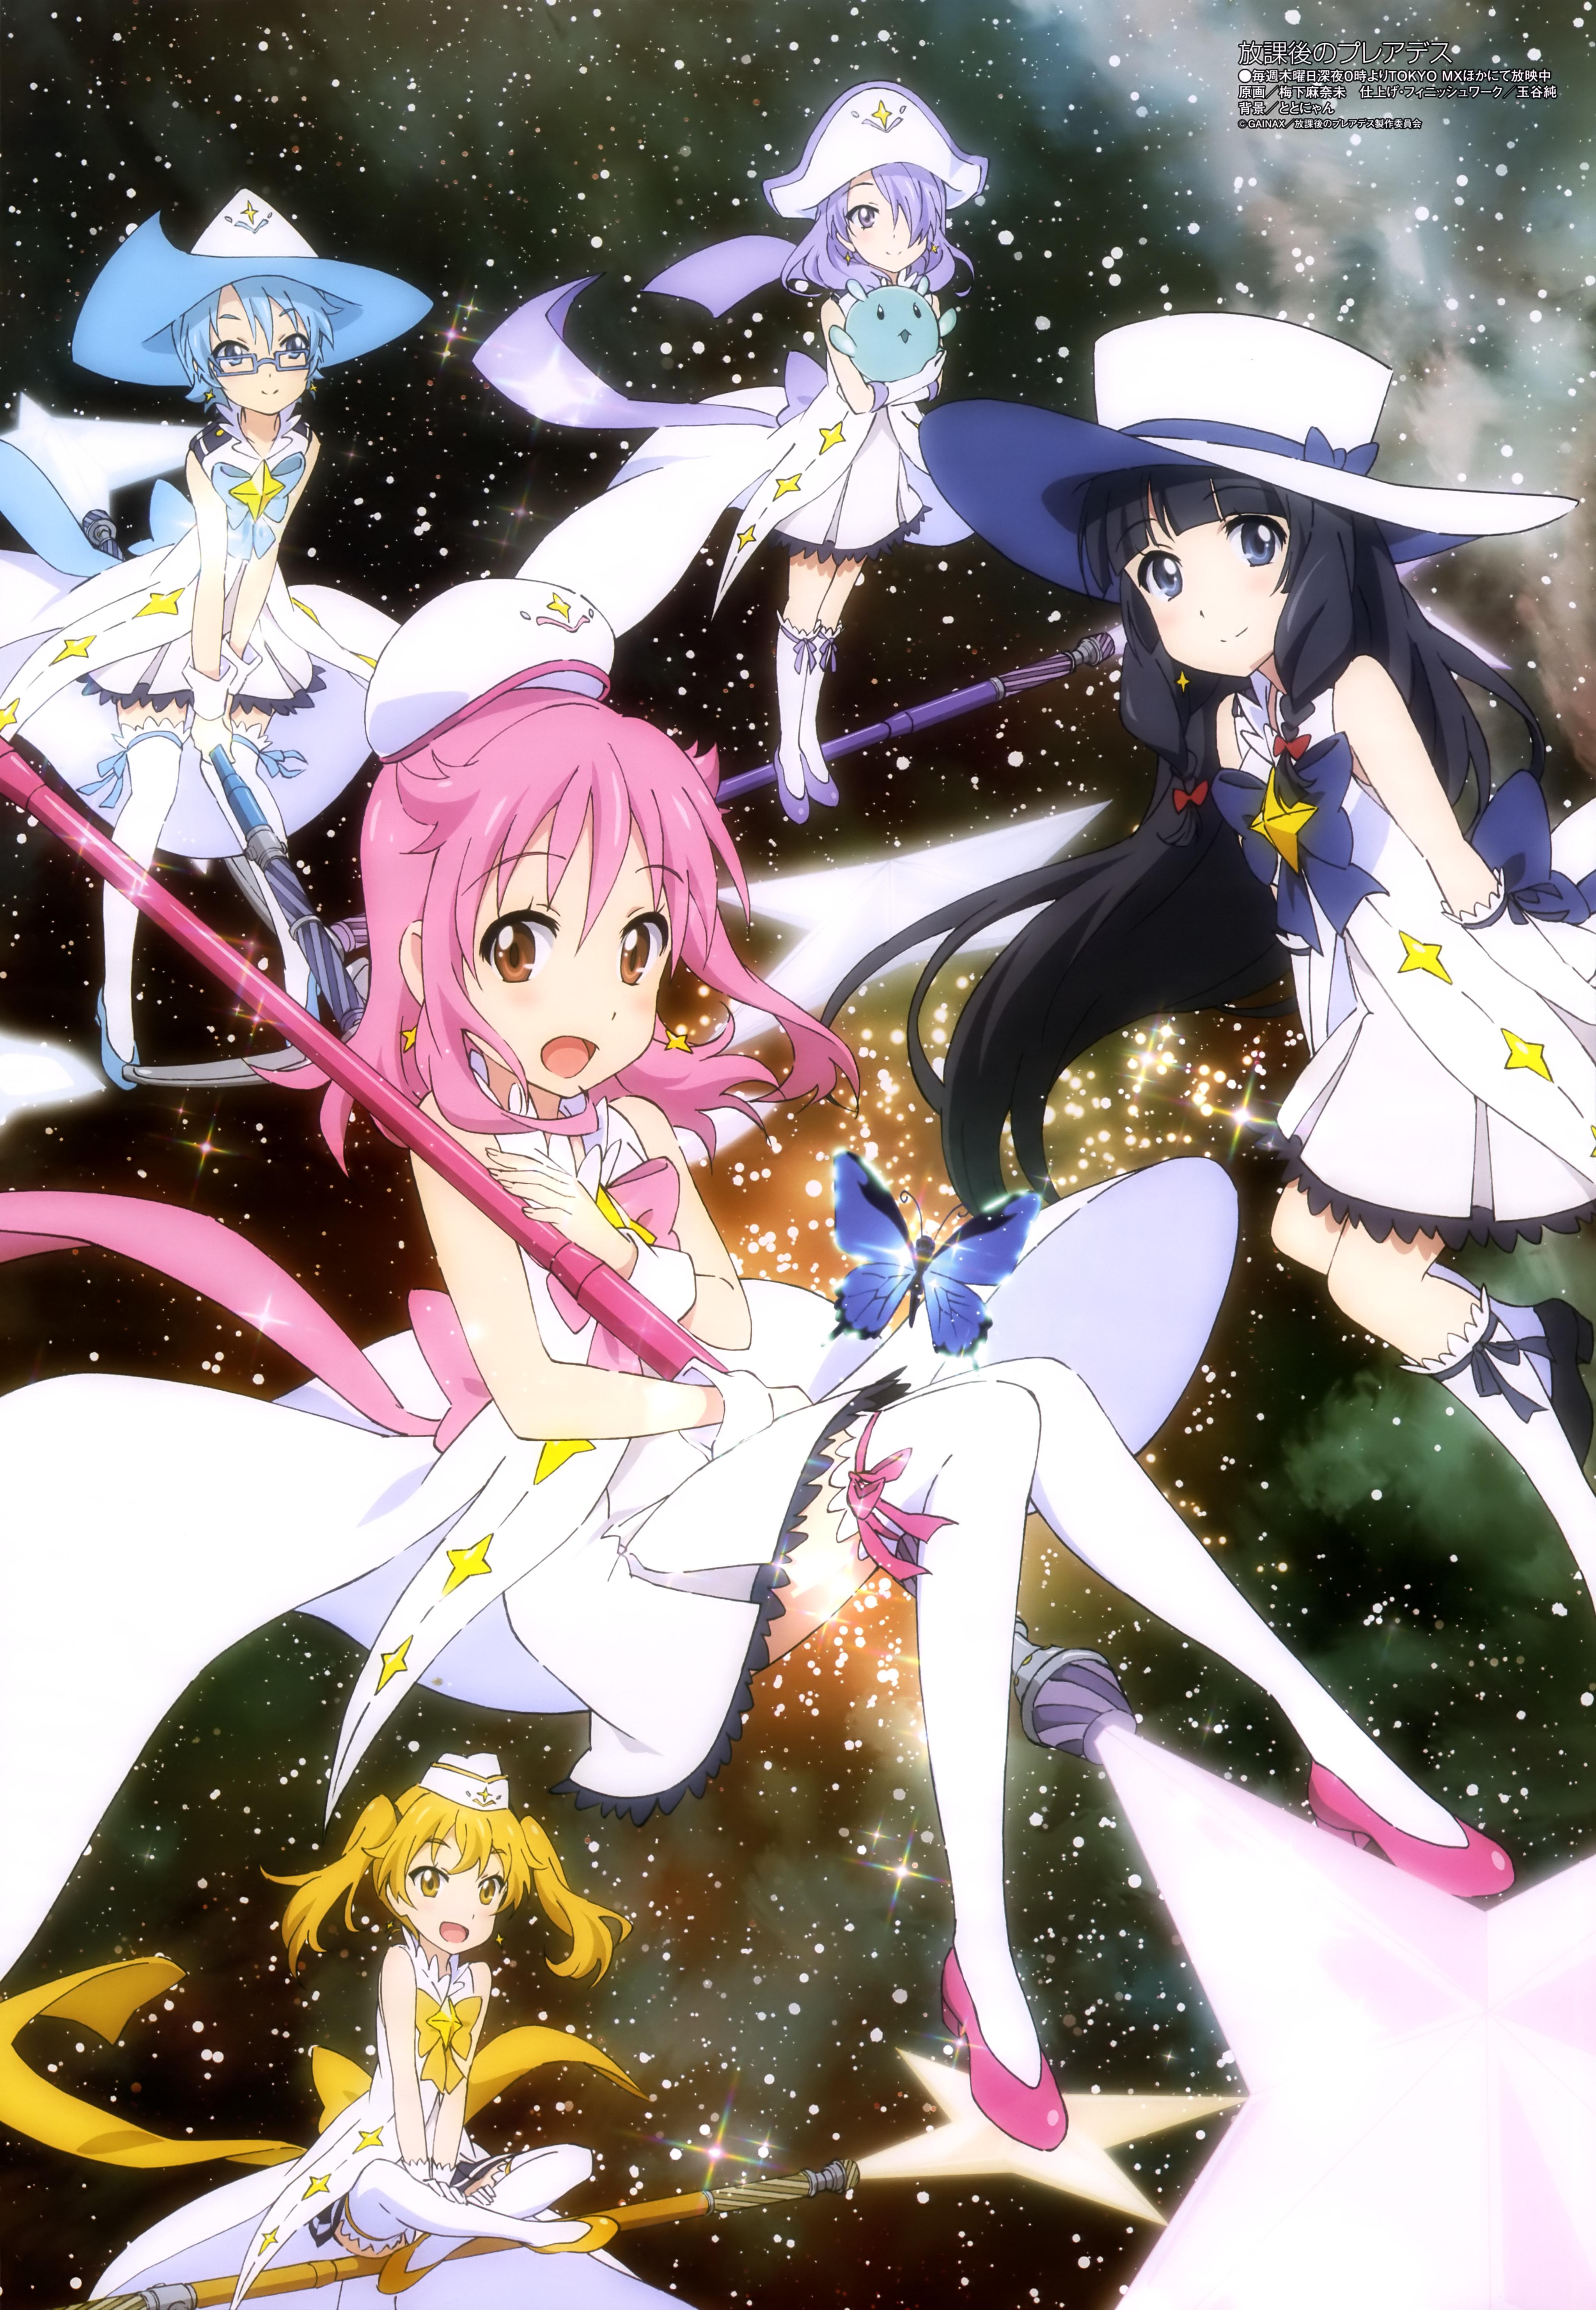 Megami MAGAZINE June 2015 anime posters Houkago no Pleiades